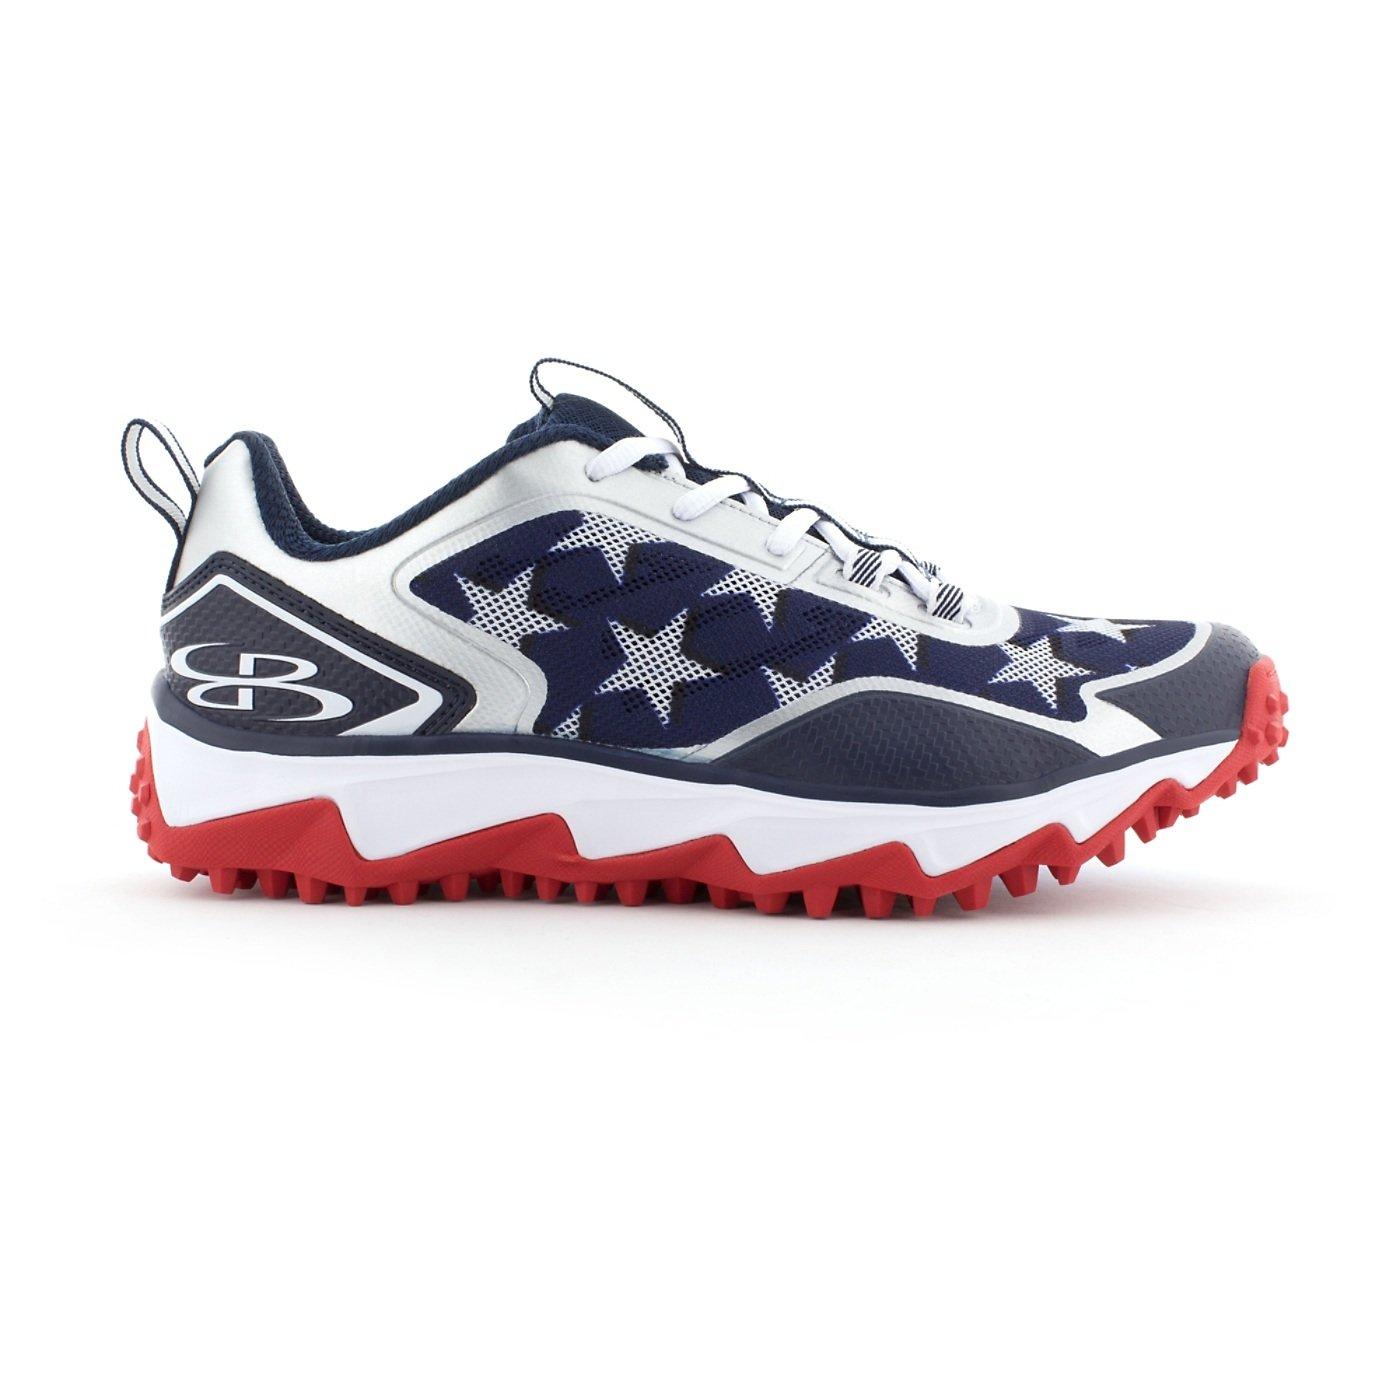 BoombahメンズBerzerk Turf Shoes – 13色オプション – 複数のサイズ B076B6JJH5ネイビー/レッド/ホワイト 14